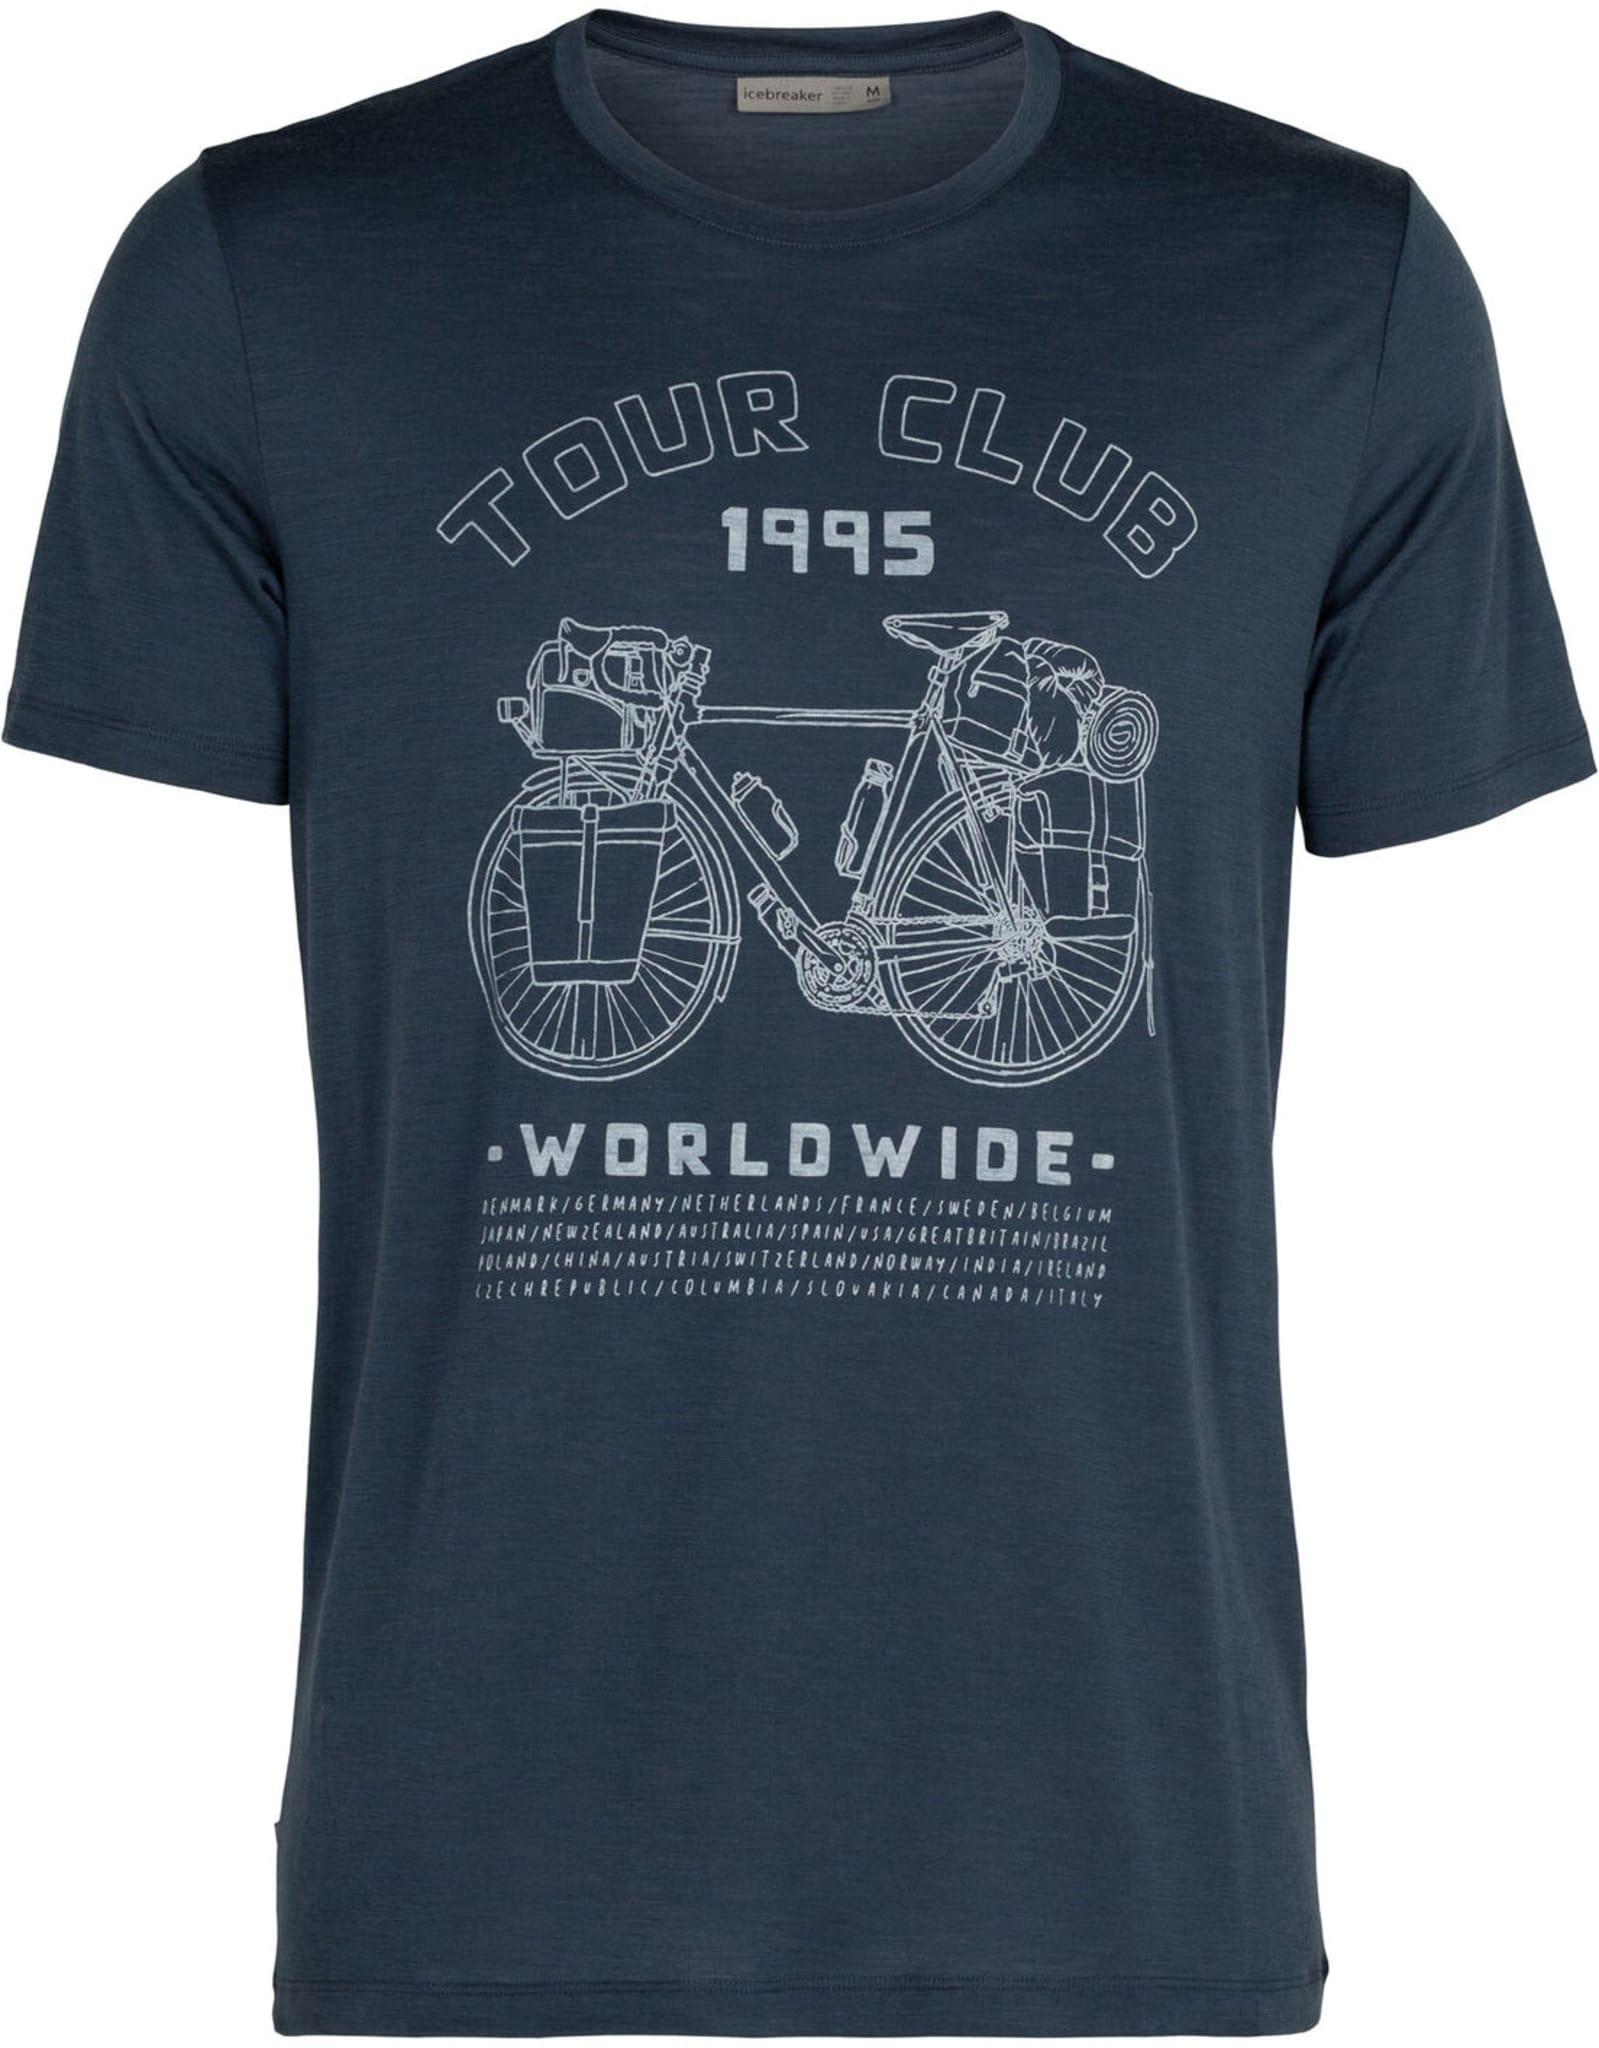 Tech Lite SS Crewe Tour Club M